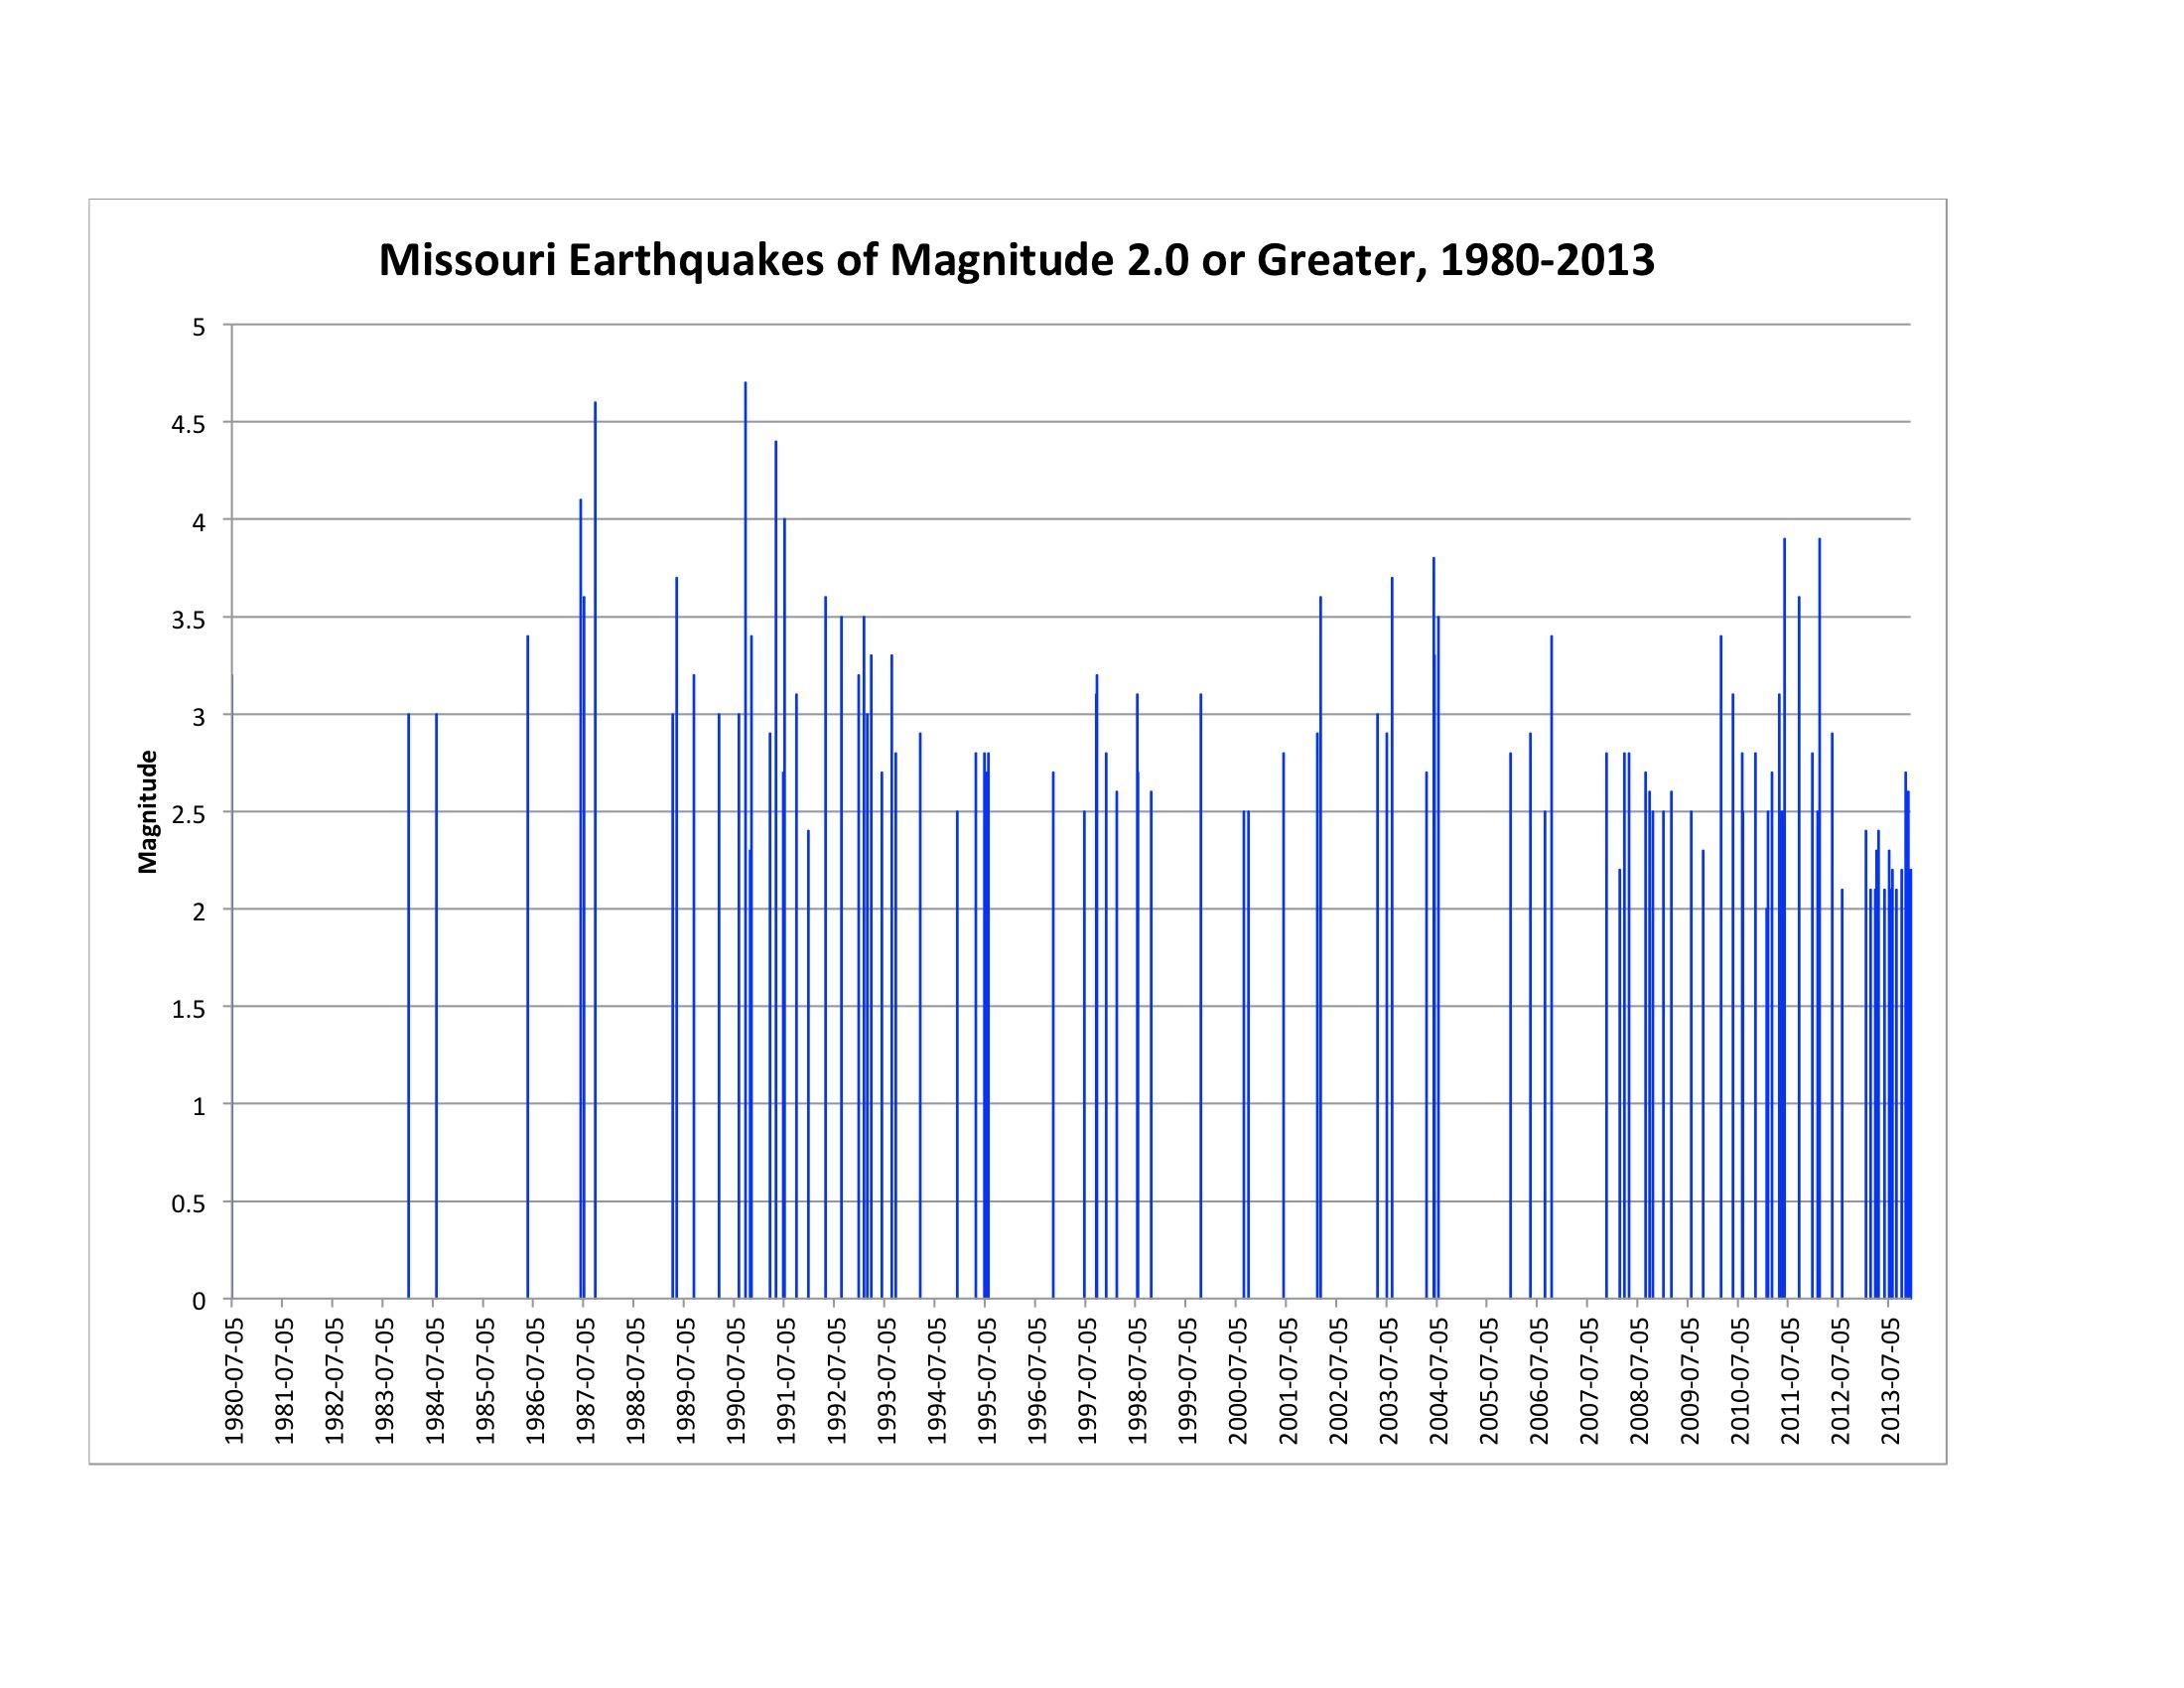 Mogreenstats missouris environmental statistics page 20 occurence chart pooptronica